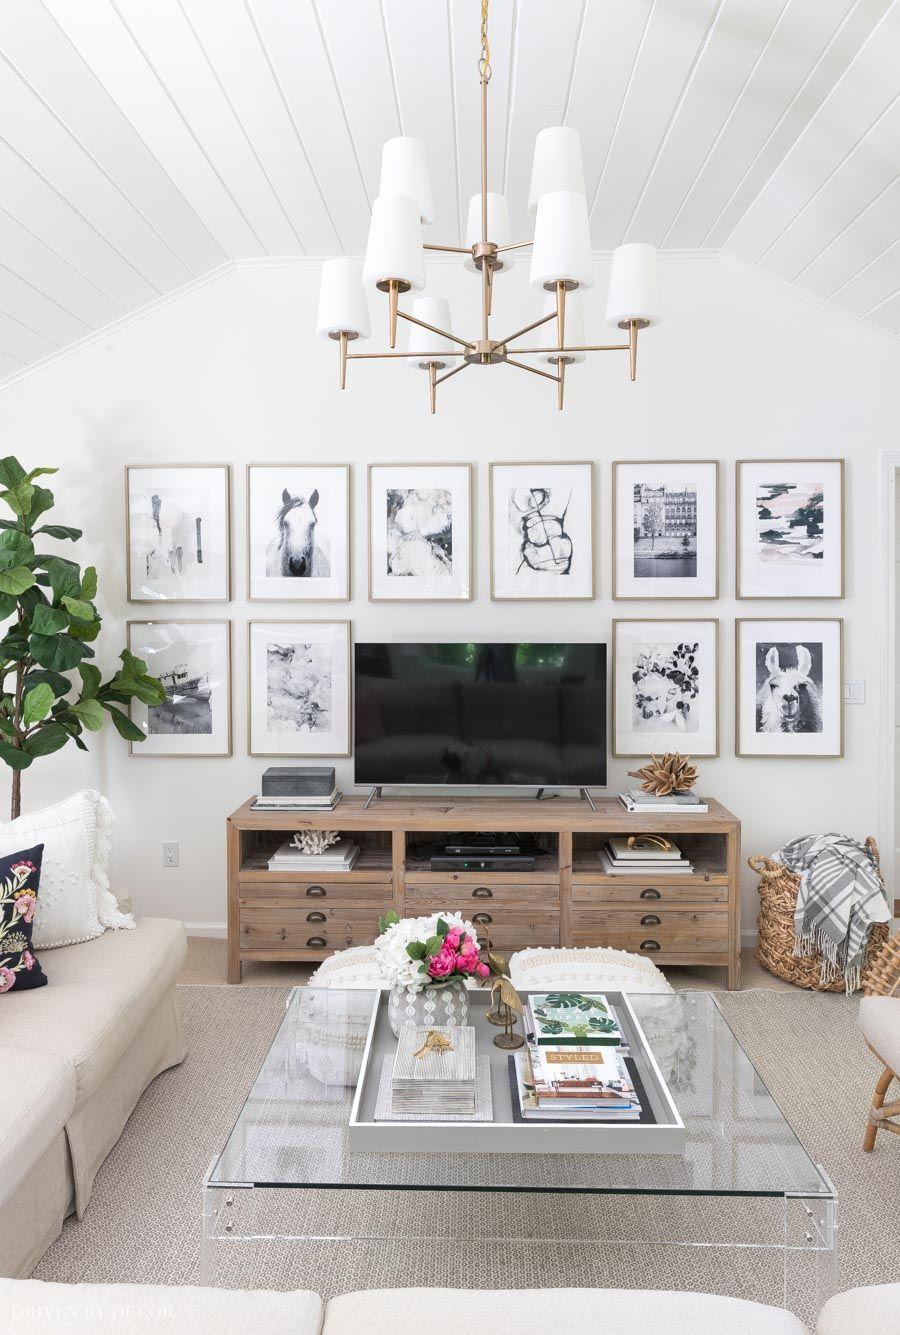 6 Living Room Wall Decor Ideas Say Goodbye To Those Bare Walls Driven By Decor Wall Decor Living Room Room Wall Decor Family Room Walls